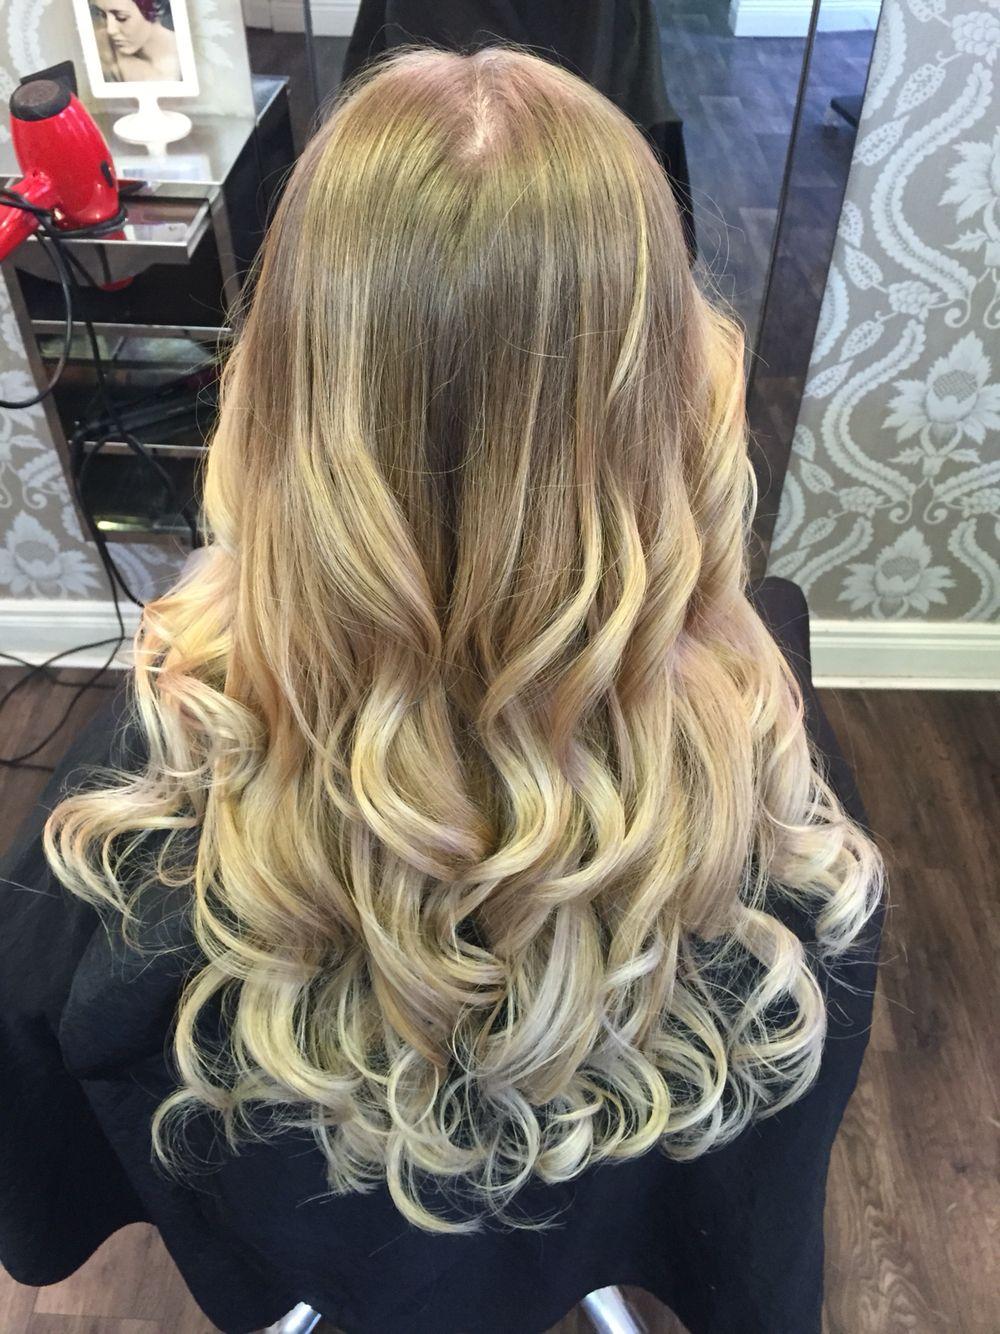 Ballayage Blond intérieur blonde waves long ballayage | hairi <3 | pinterest | blondes